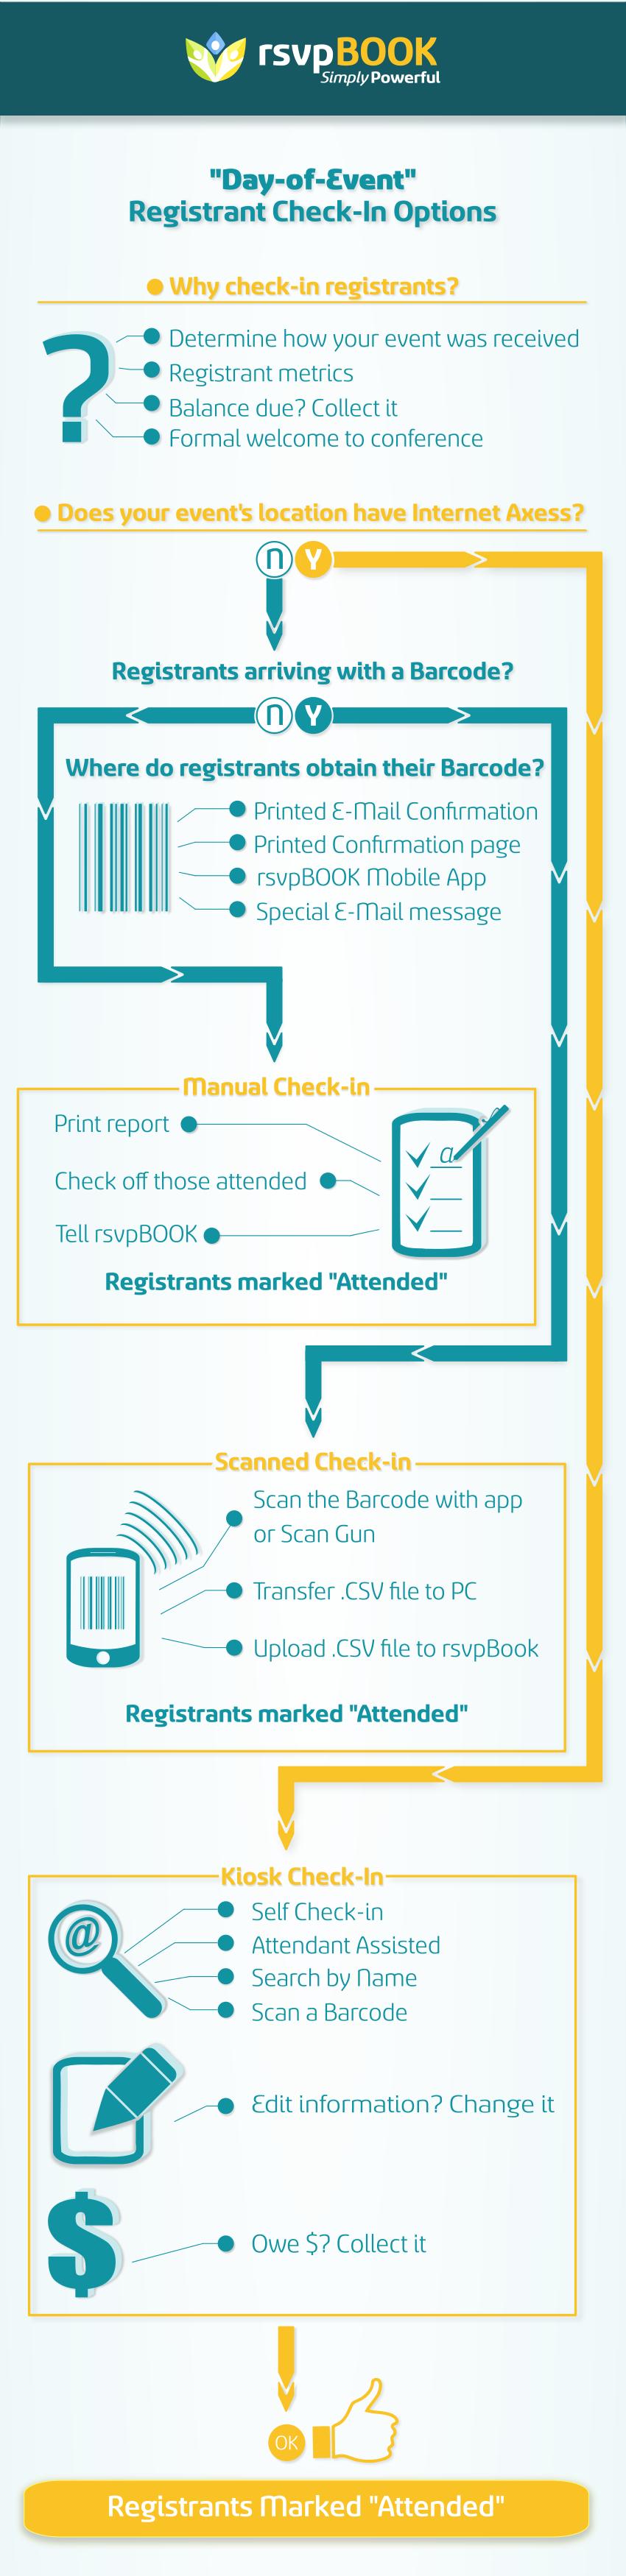 rsvpbook_infographic2(1)